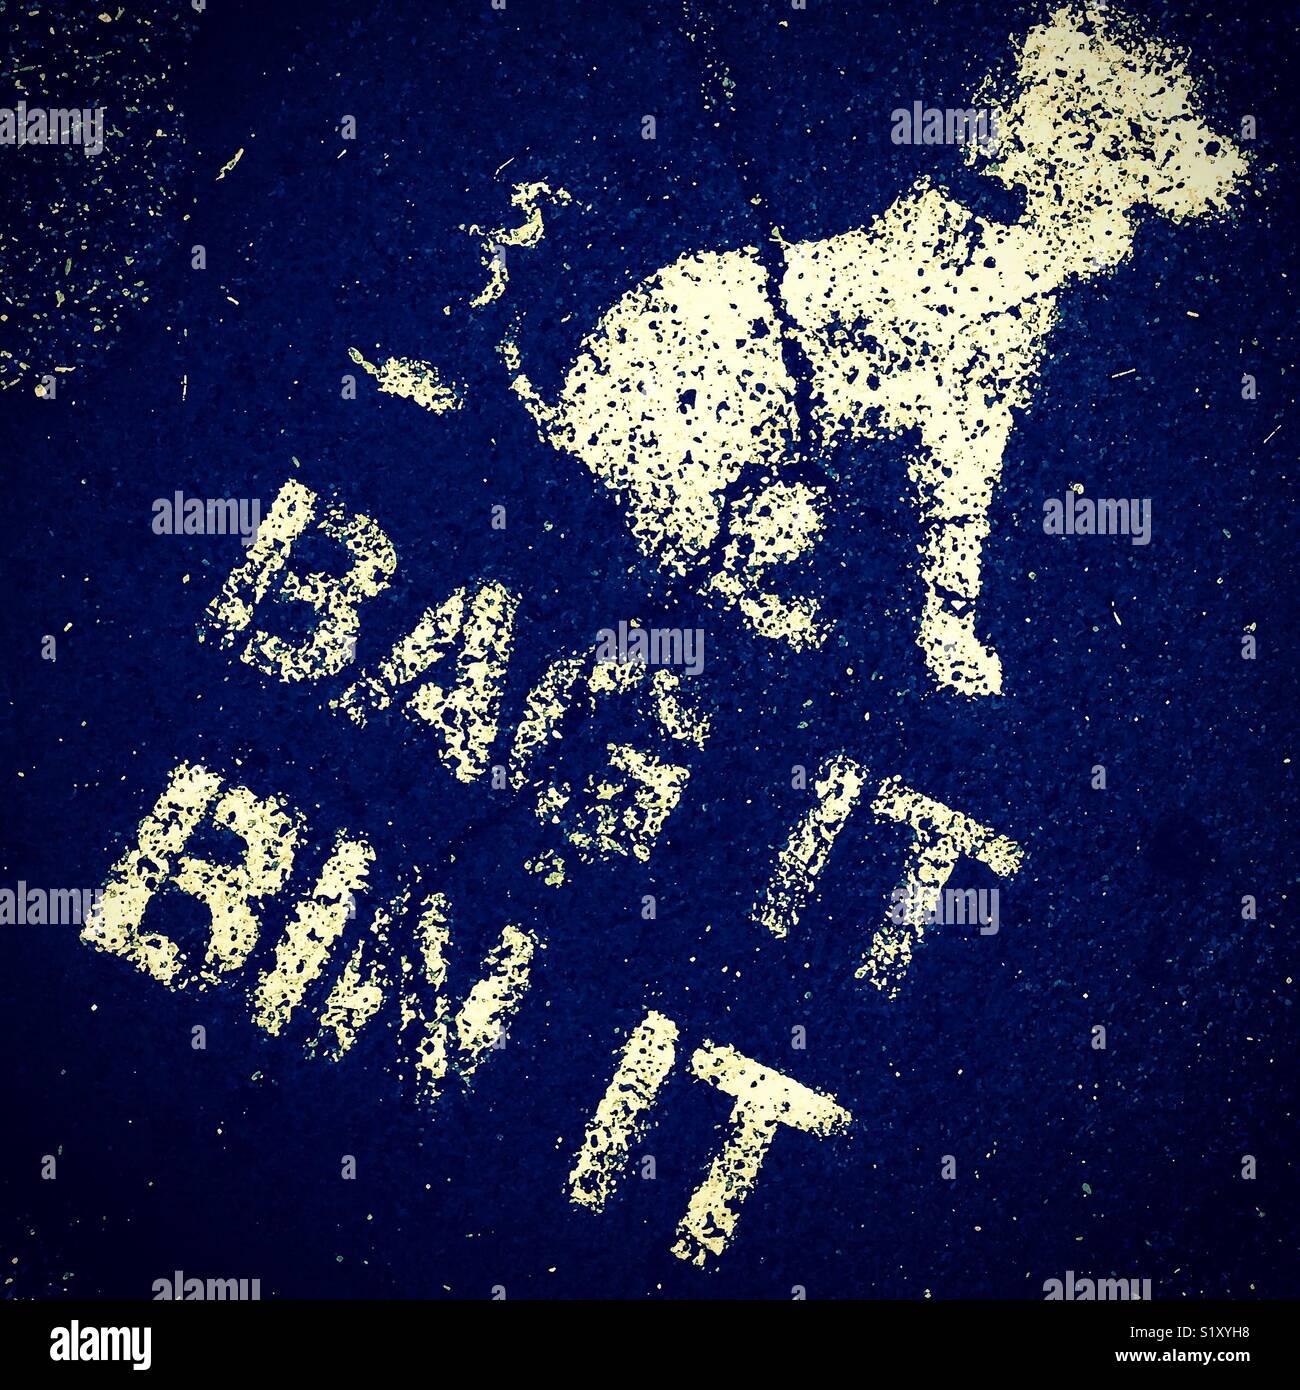 Bag it bin it keep dogs mess in the bins - Stock Image